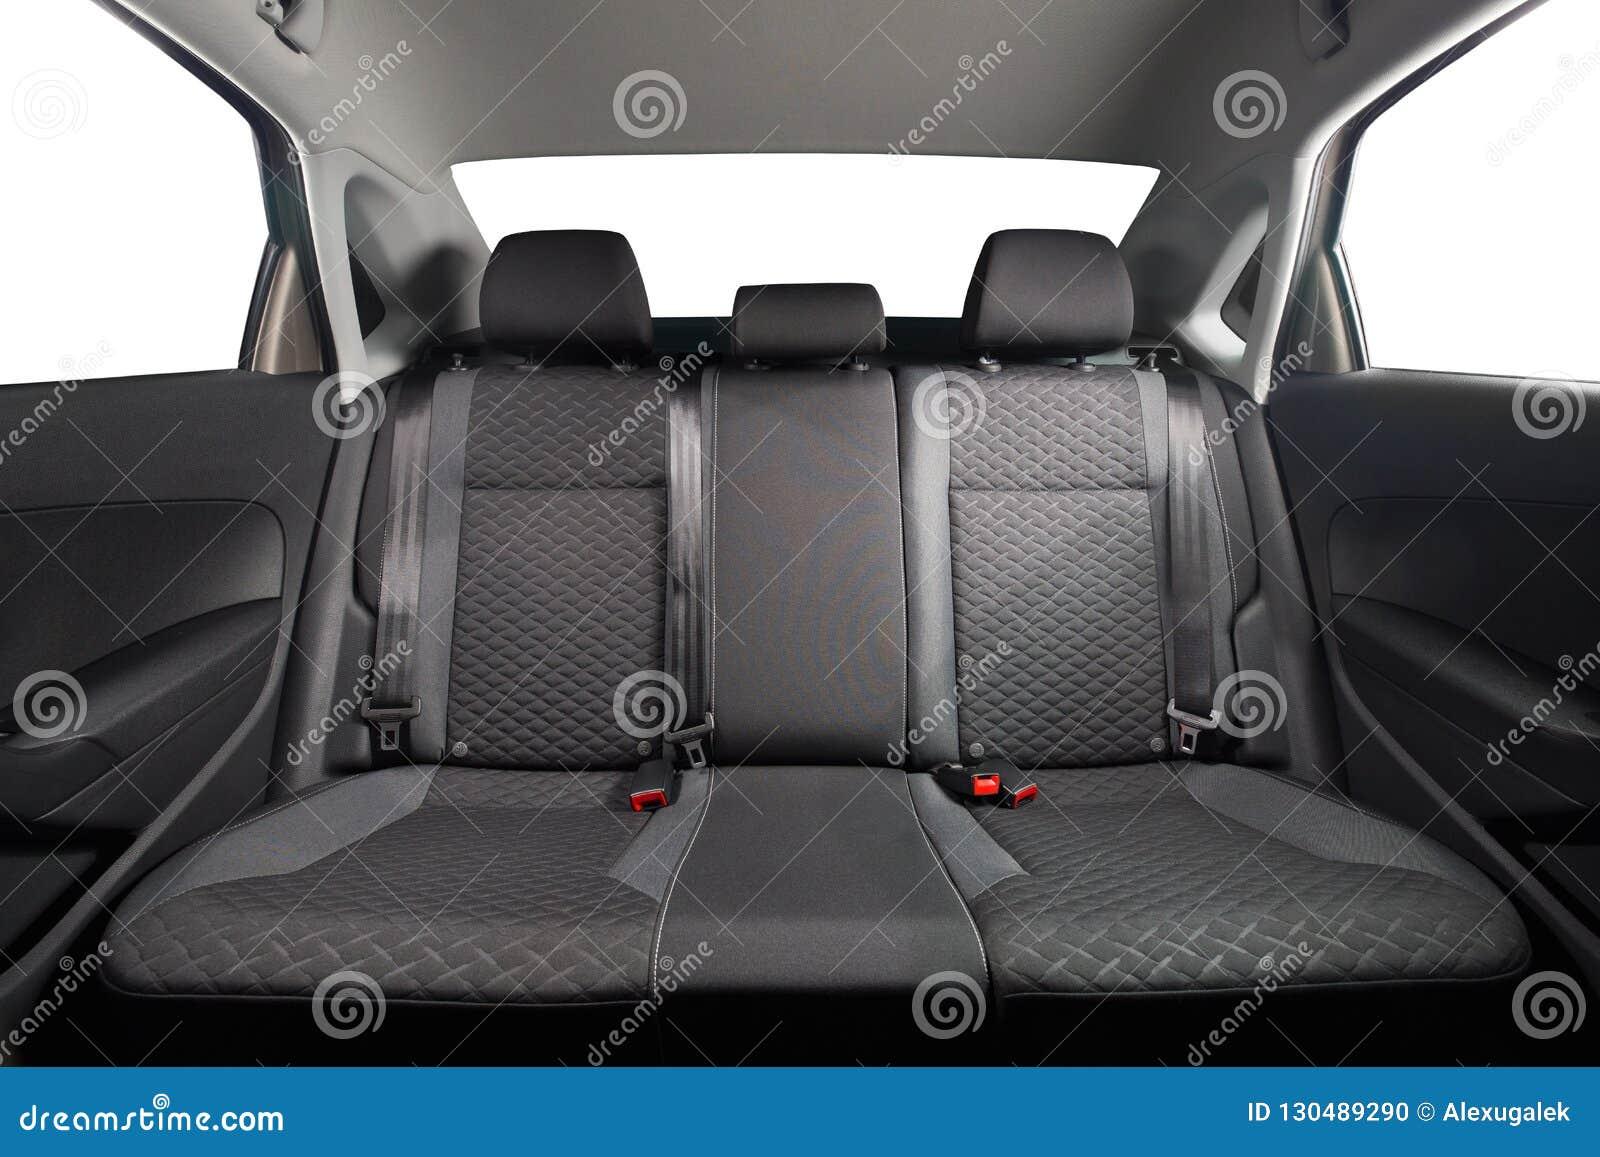 New Car Inside Clean Car Interior Black Back Seats In Sedan Stock Photo Image Of Back Clean 130489290